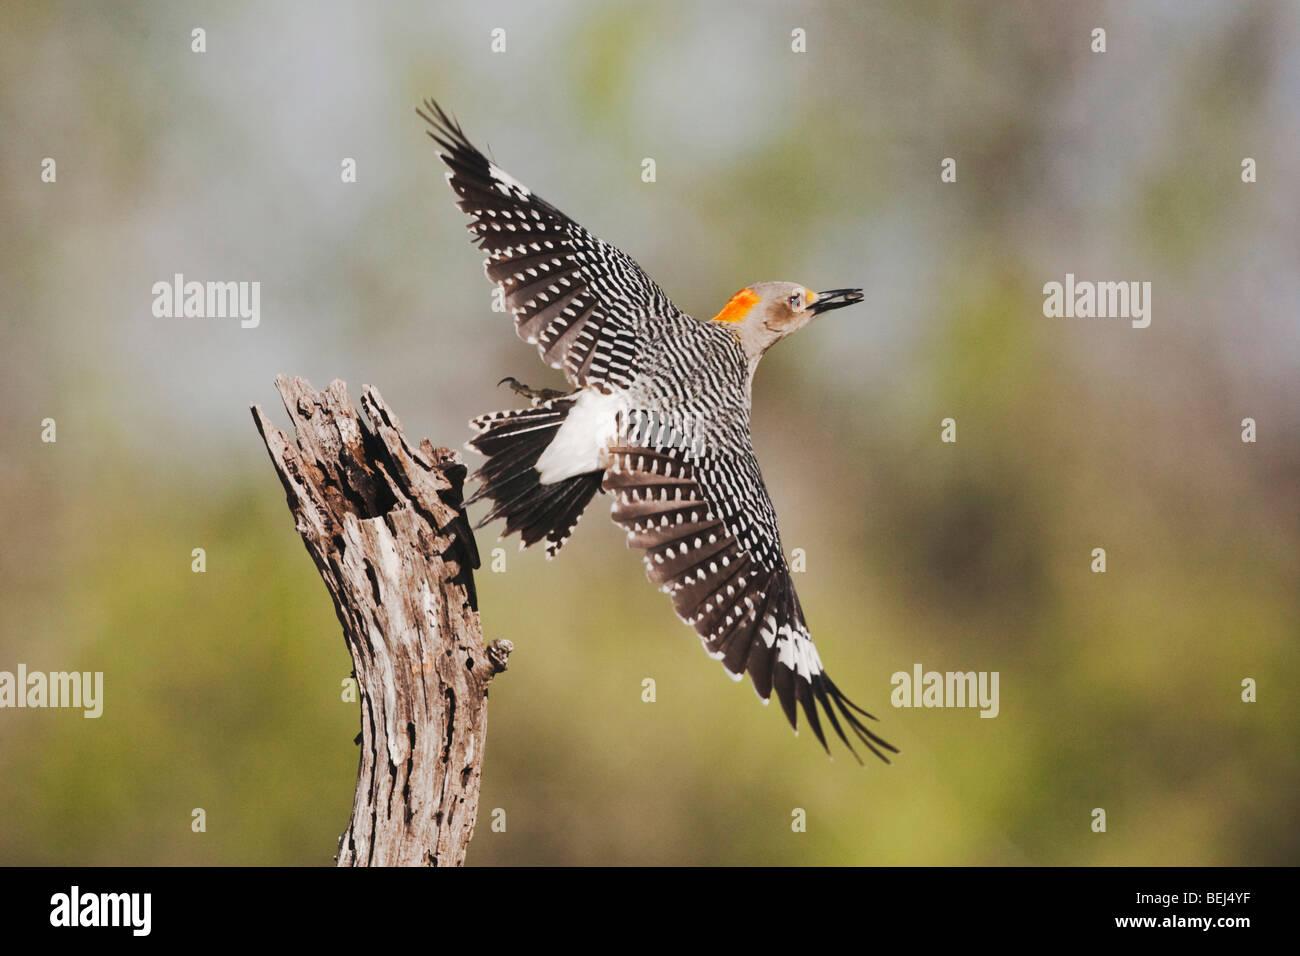 Golden-fronted Woodpecker (Melanerpes aurifrons), female taking off, Sinton, Corpus Christi, Coastal Bend, Texas, USA Stock Photo